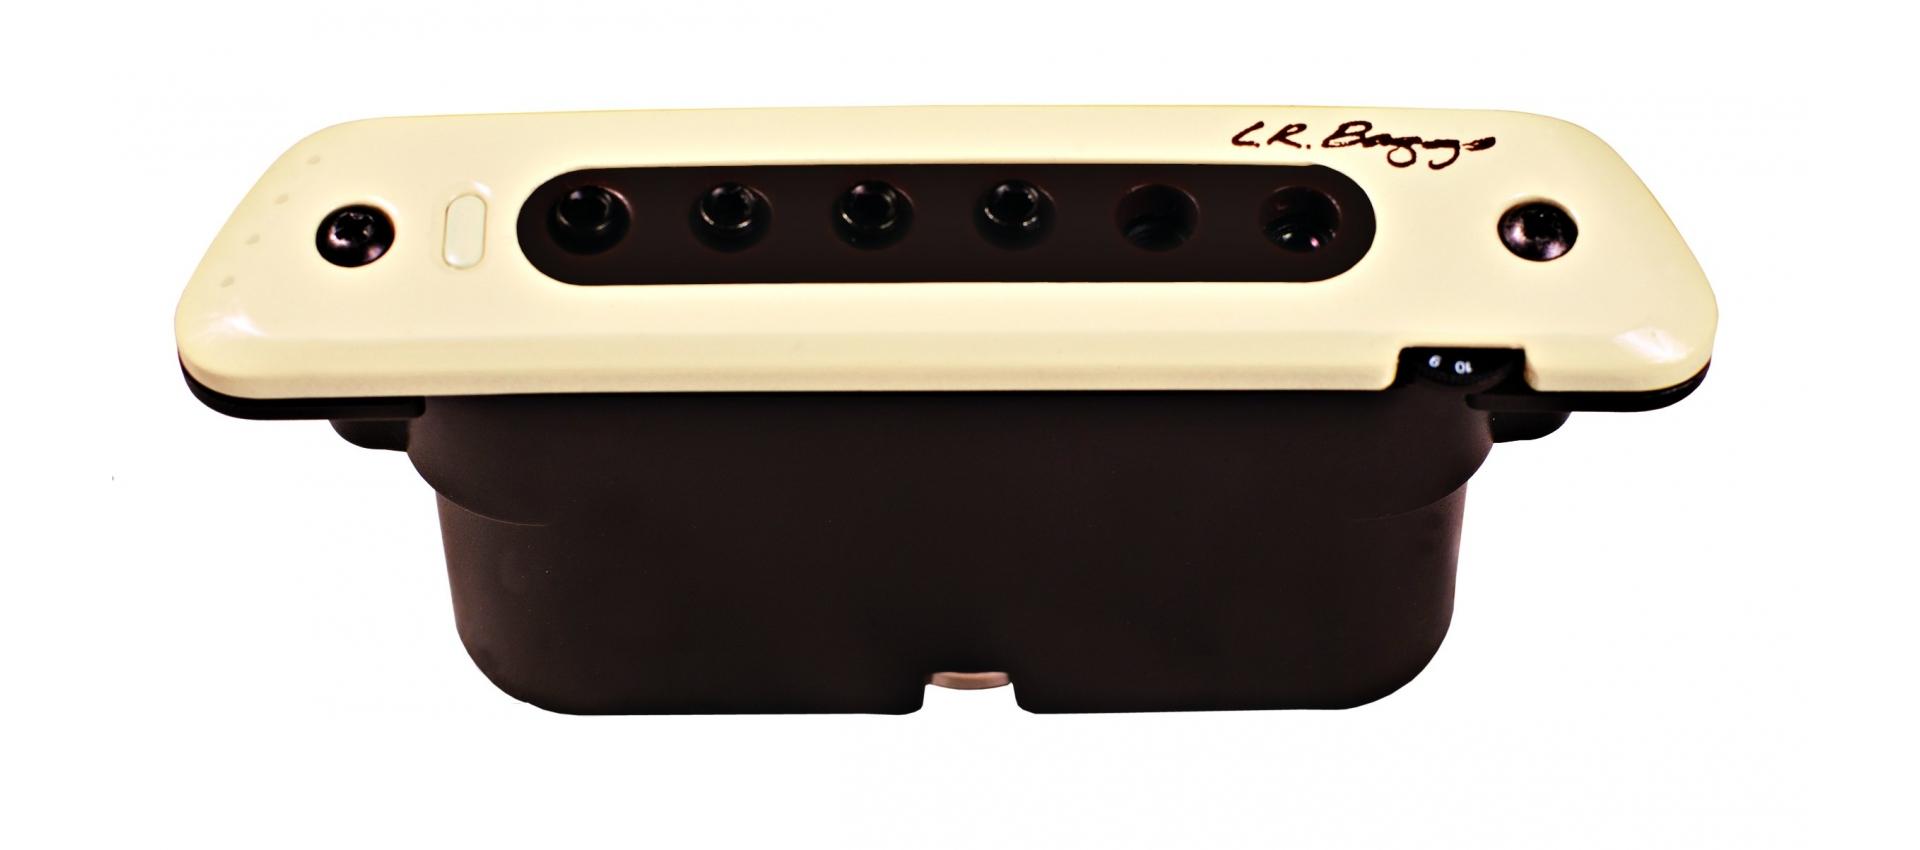 lr baggs m80 3d body active passive acoustic guitar soundhole pickup luckymusic. Black Bedroom Furniture Sets. Home Design Ideas